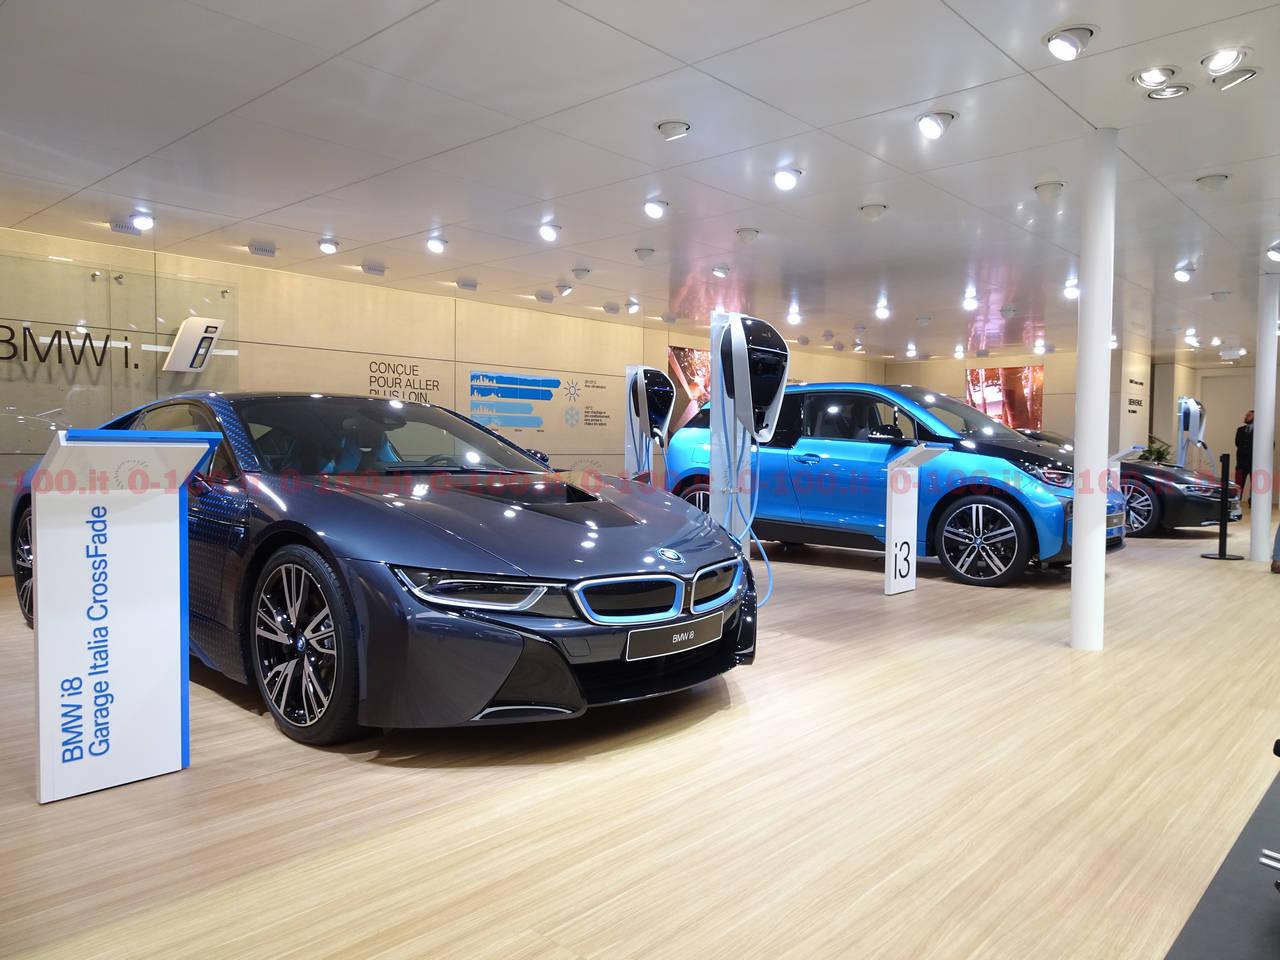 Ginevra-geneva-geneve-2017-BMW-i3-i8-0-100_1